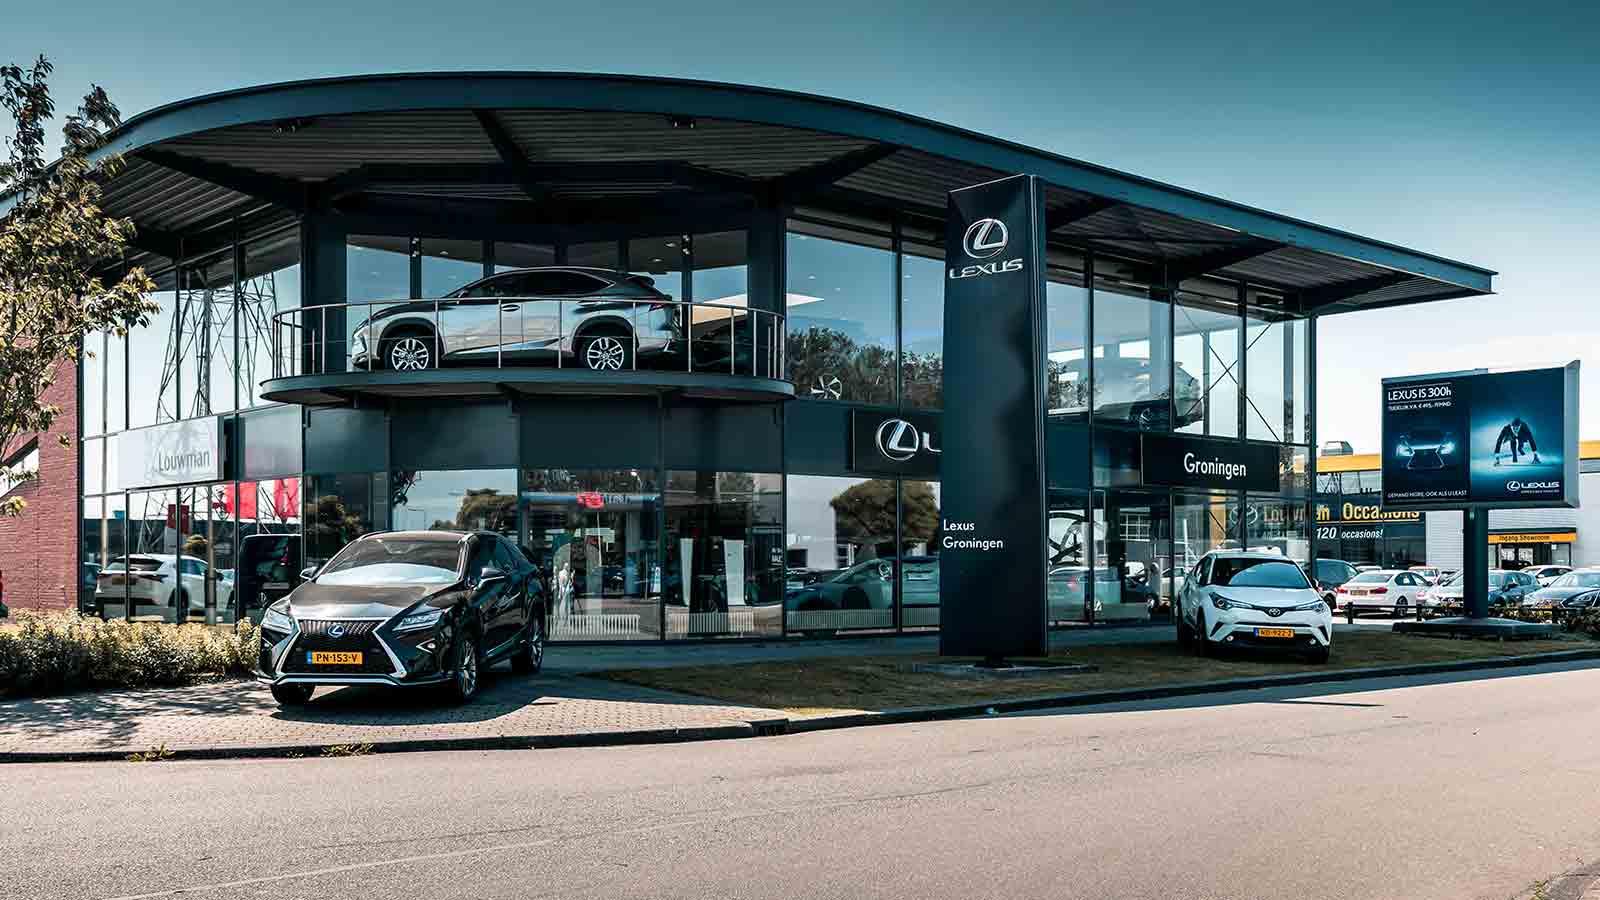 Louwman Lexus Groningen